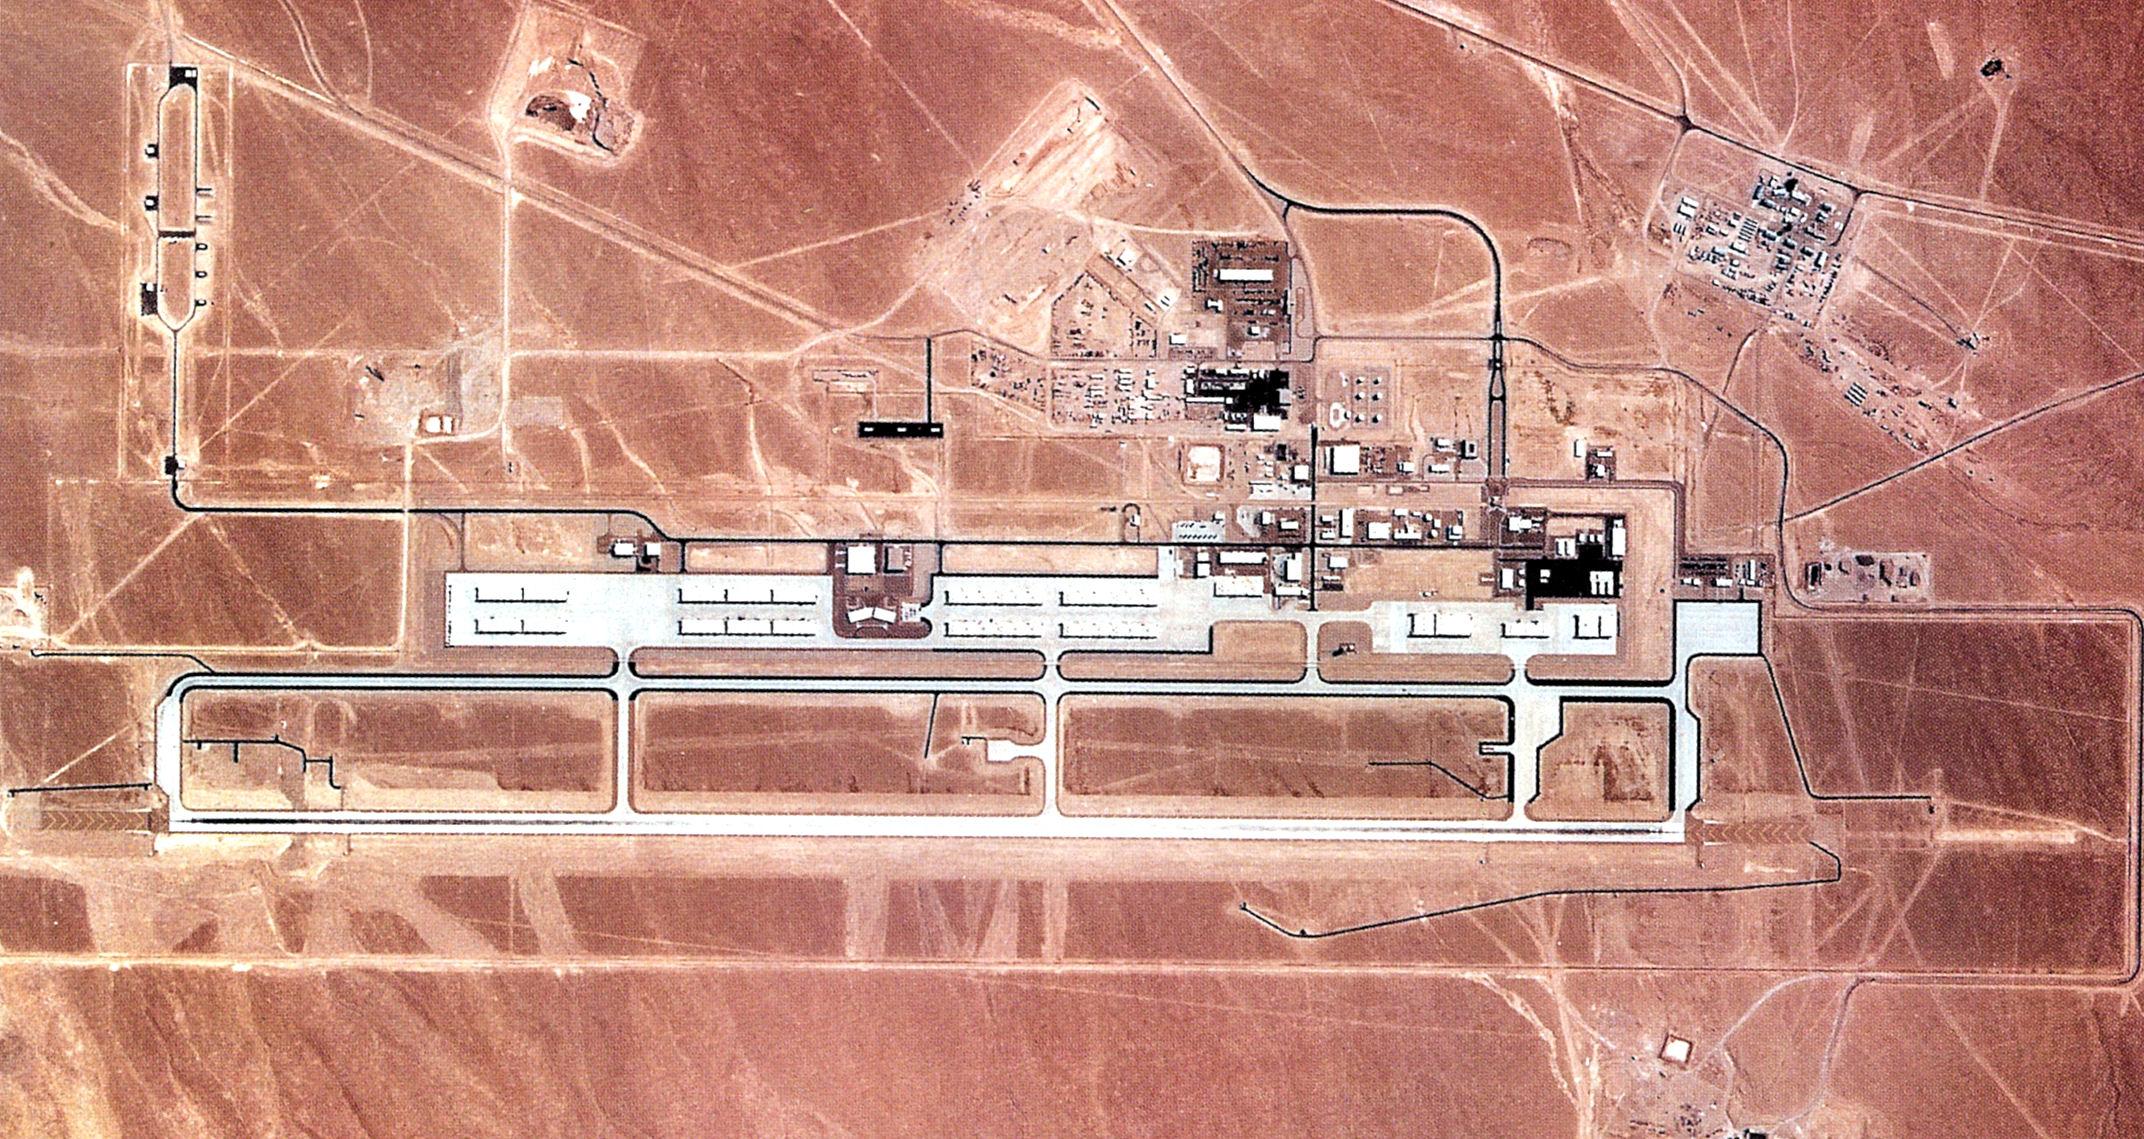 tonopah test range airport wikipedia